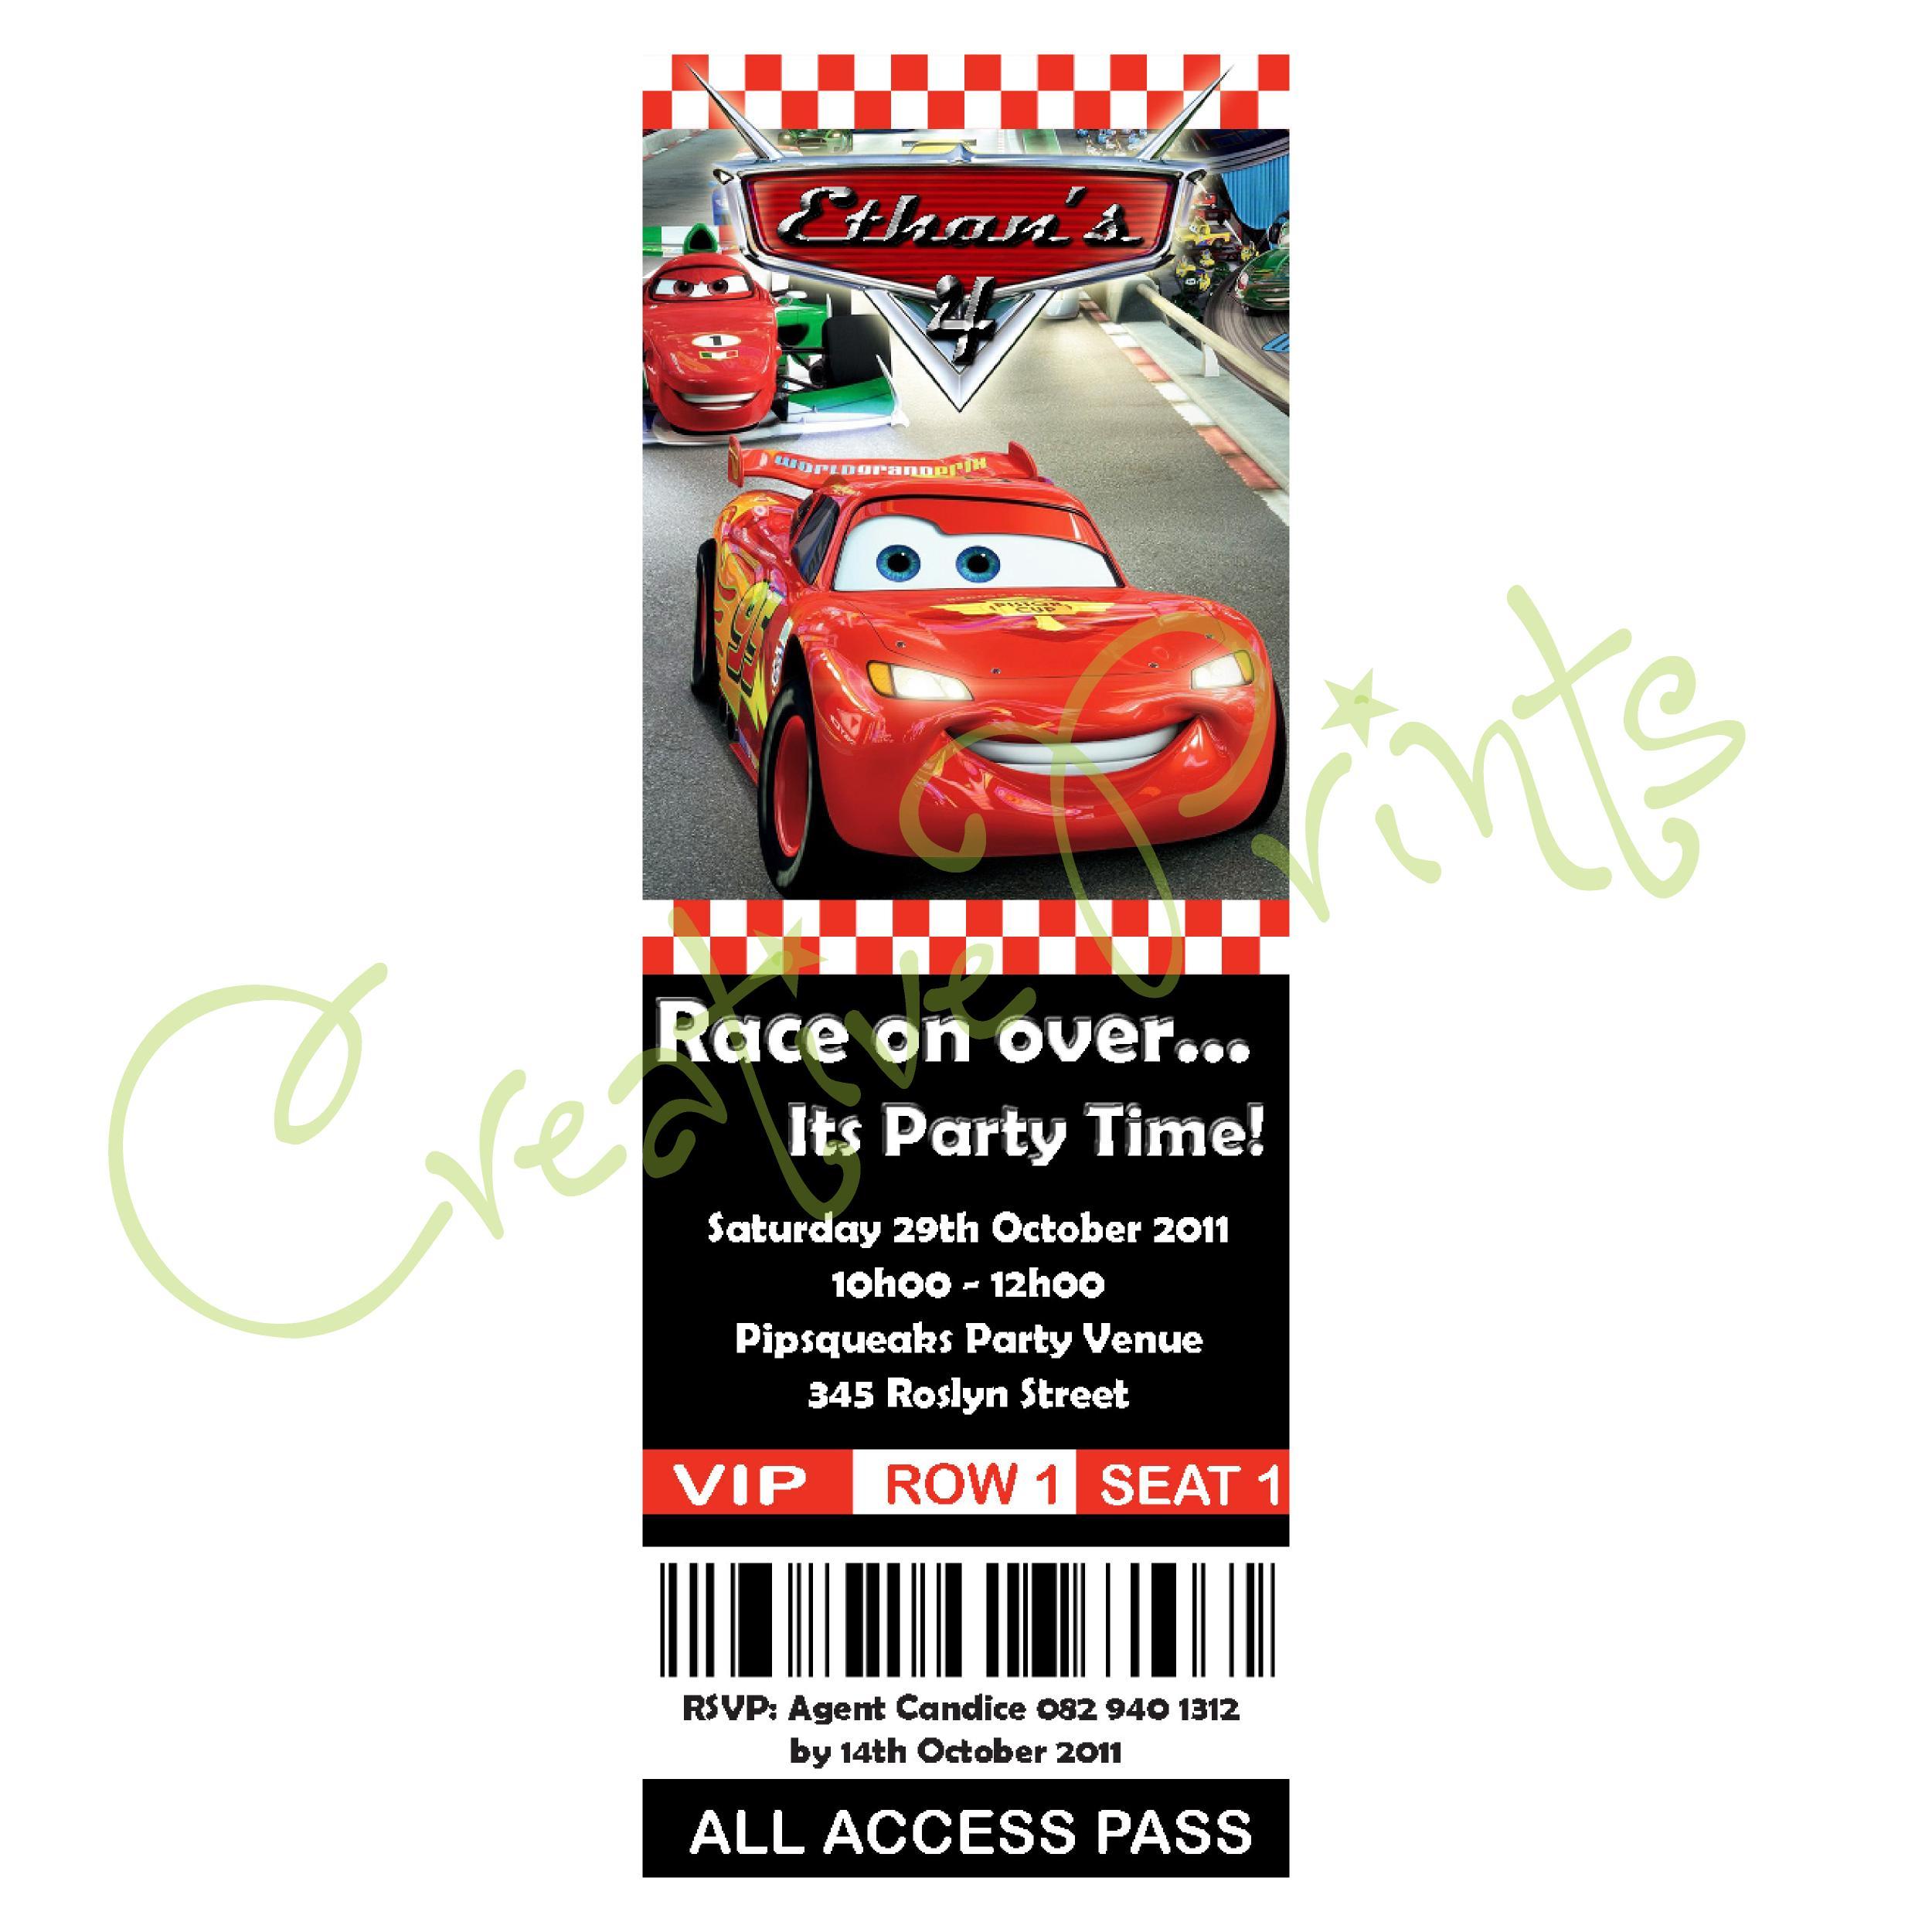 Disney Cars Party Invite | Creative Prints